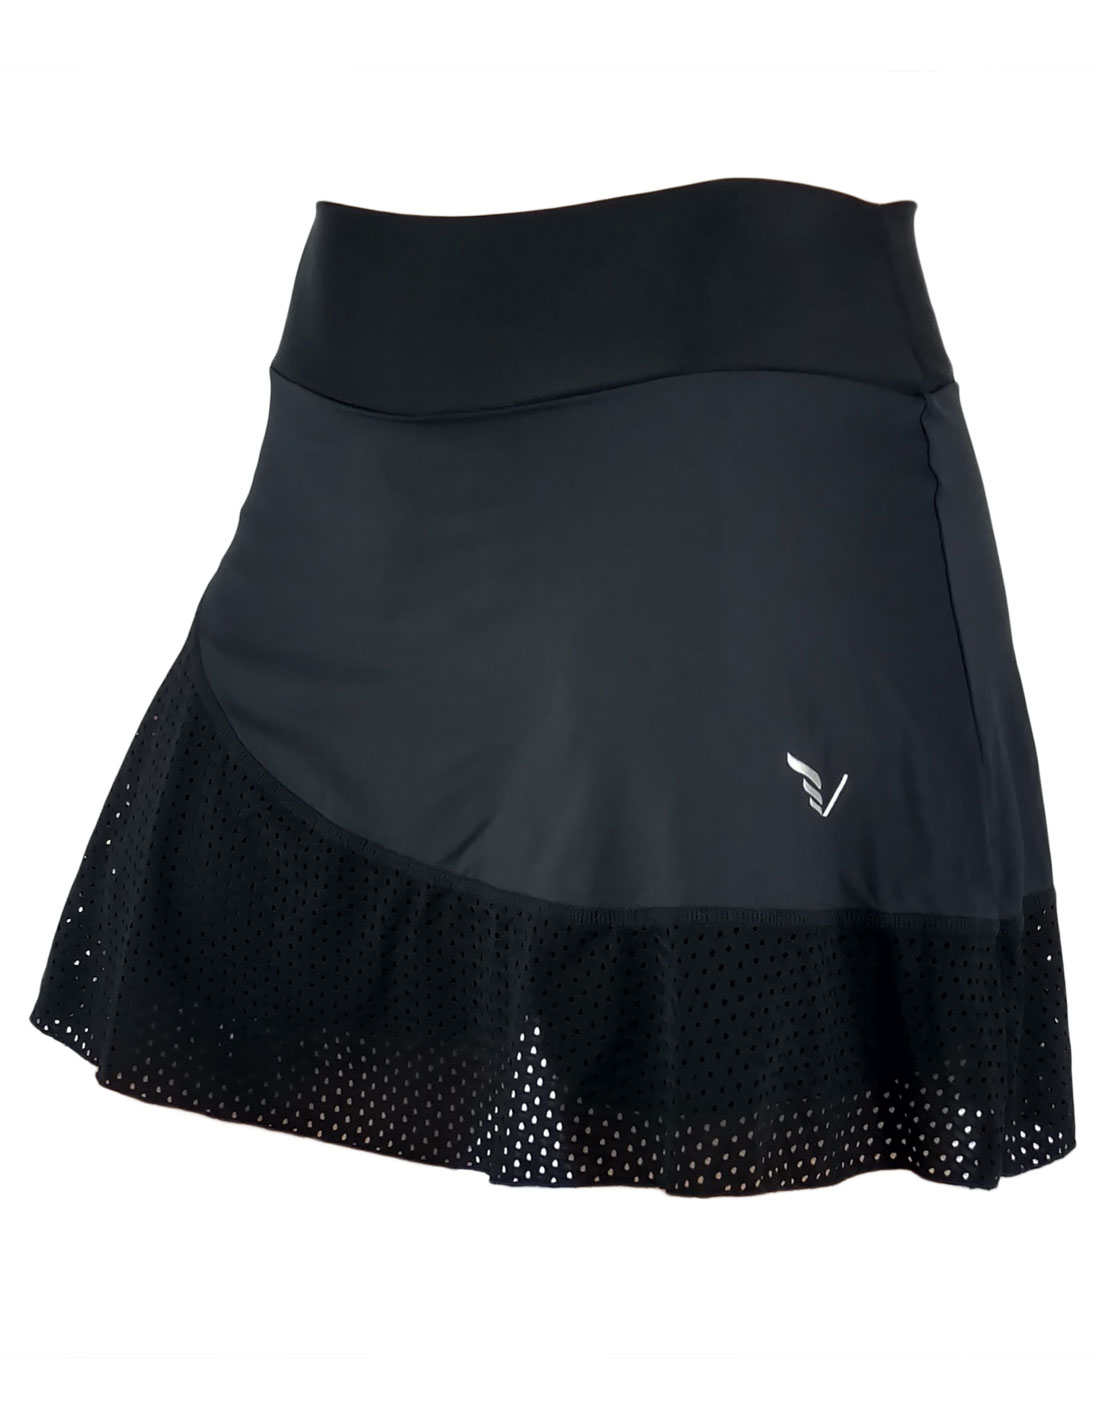 Shorts Saia Cycling Fundy Villa Sports PRETO